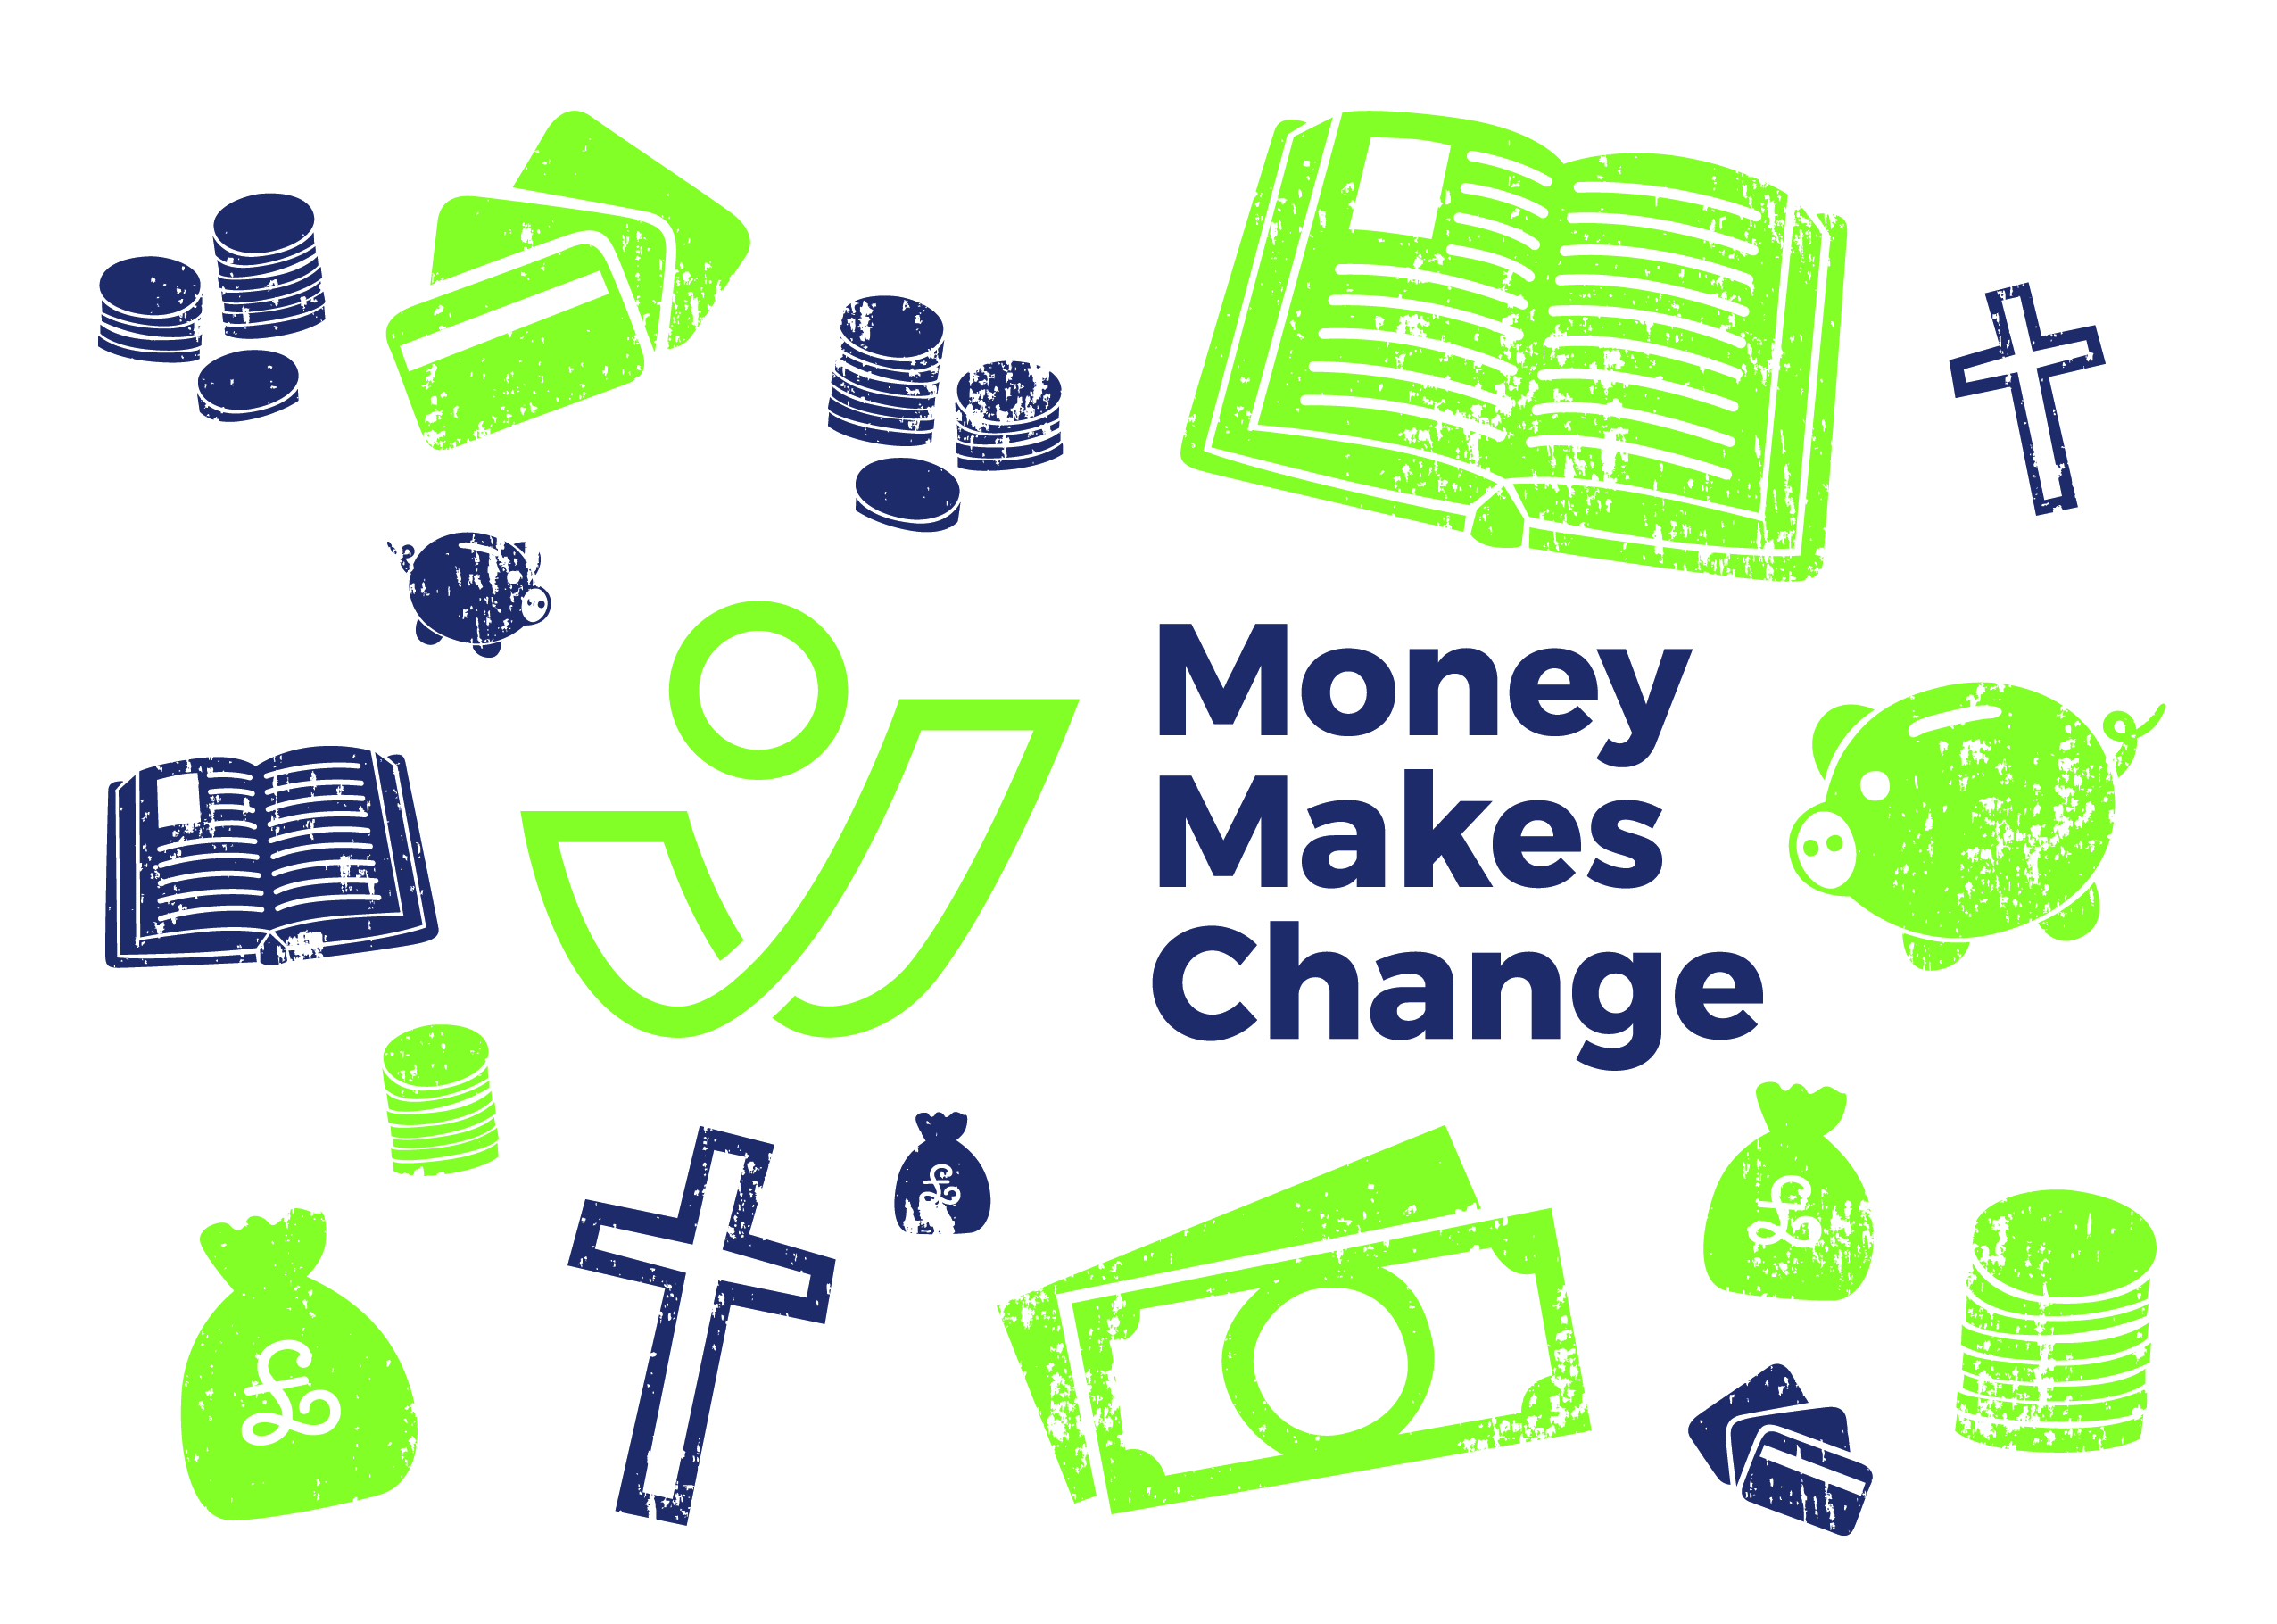 ECCR launches Money Makes Change